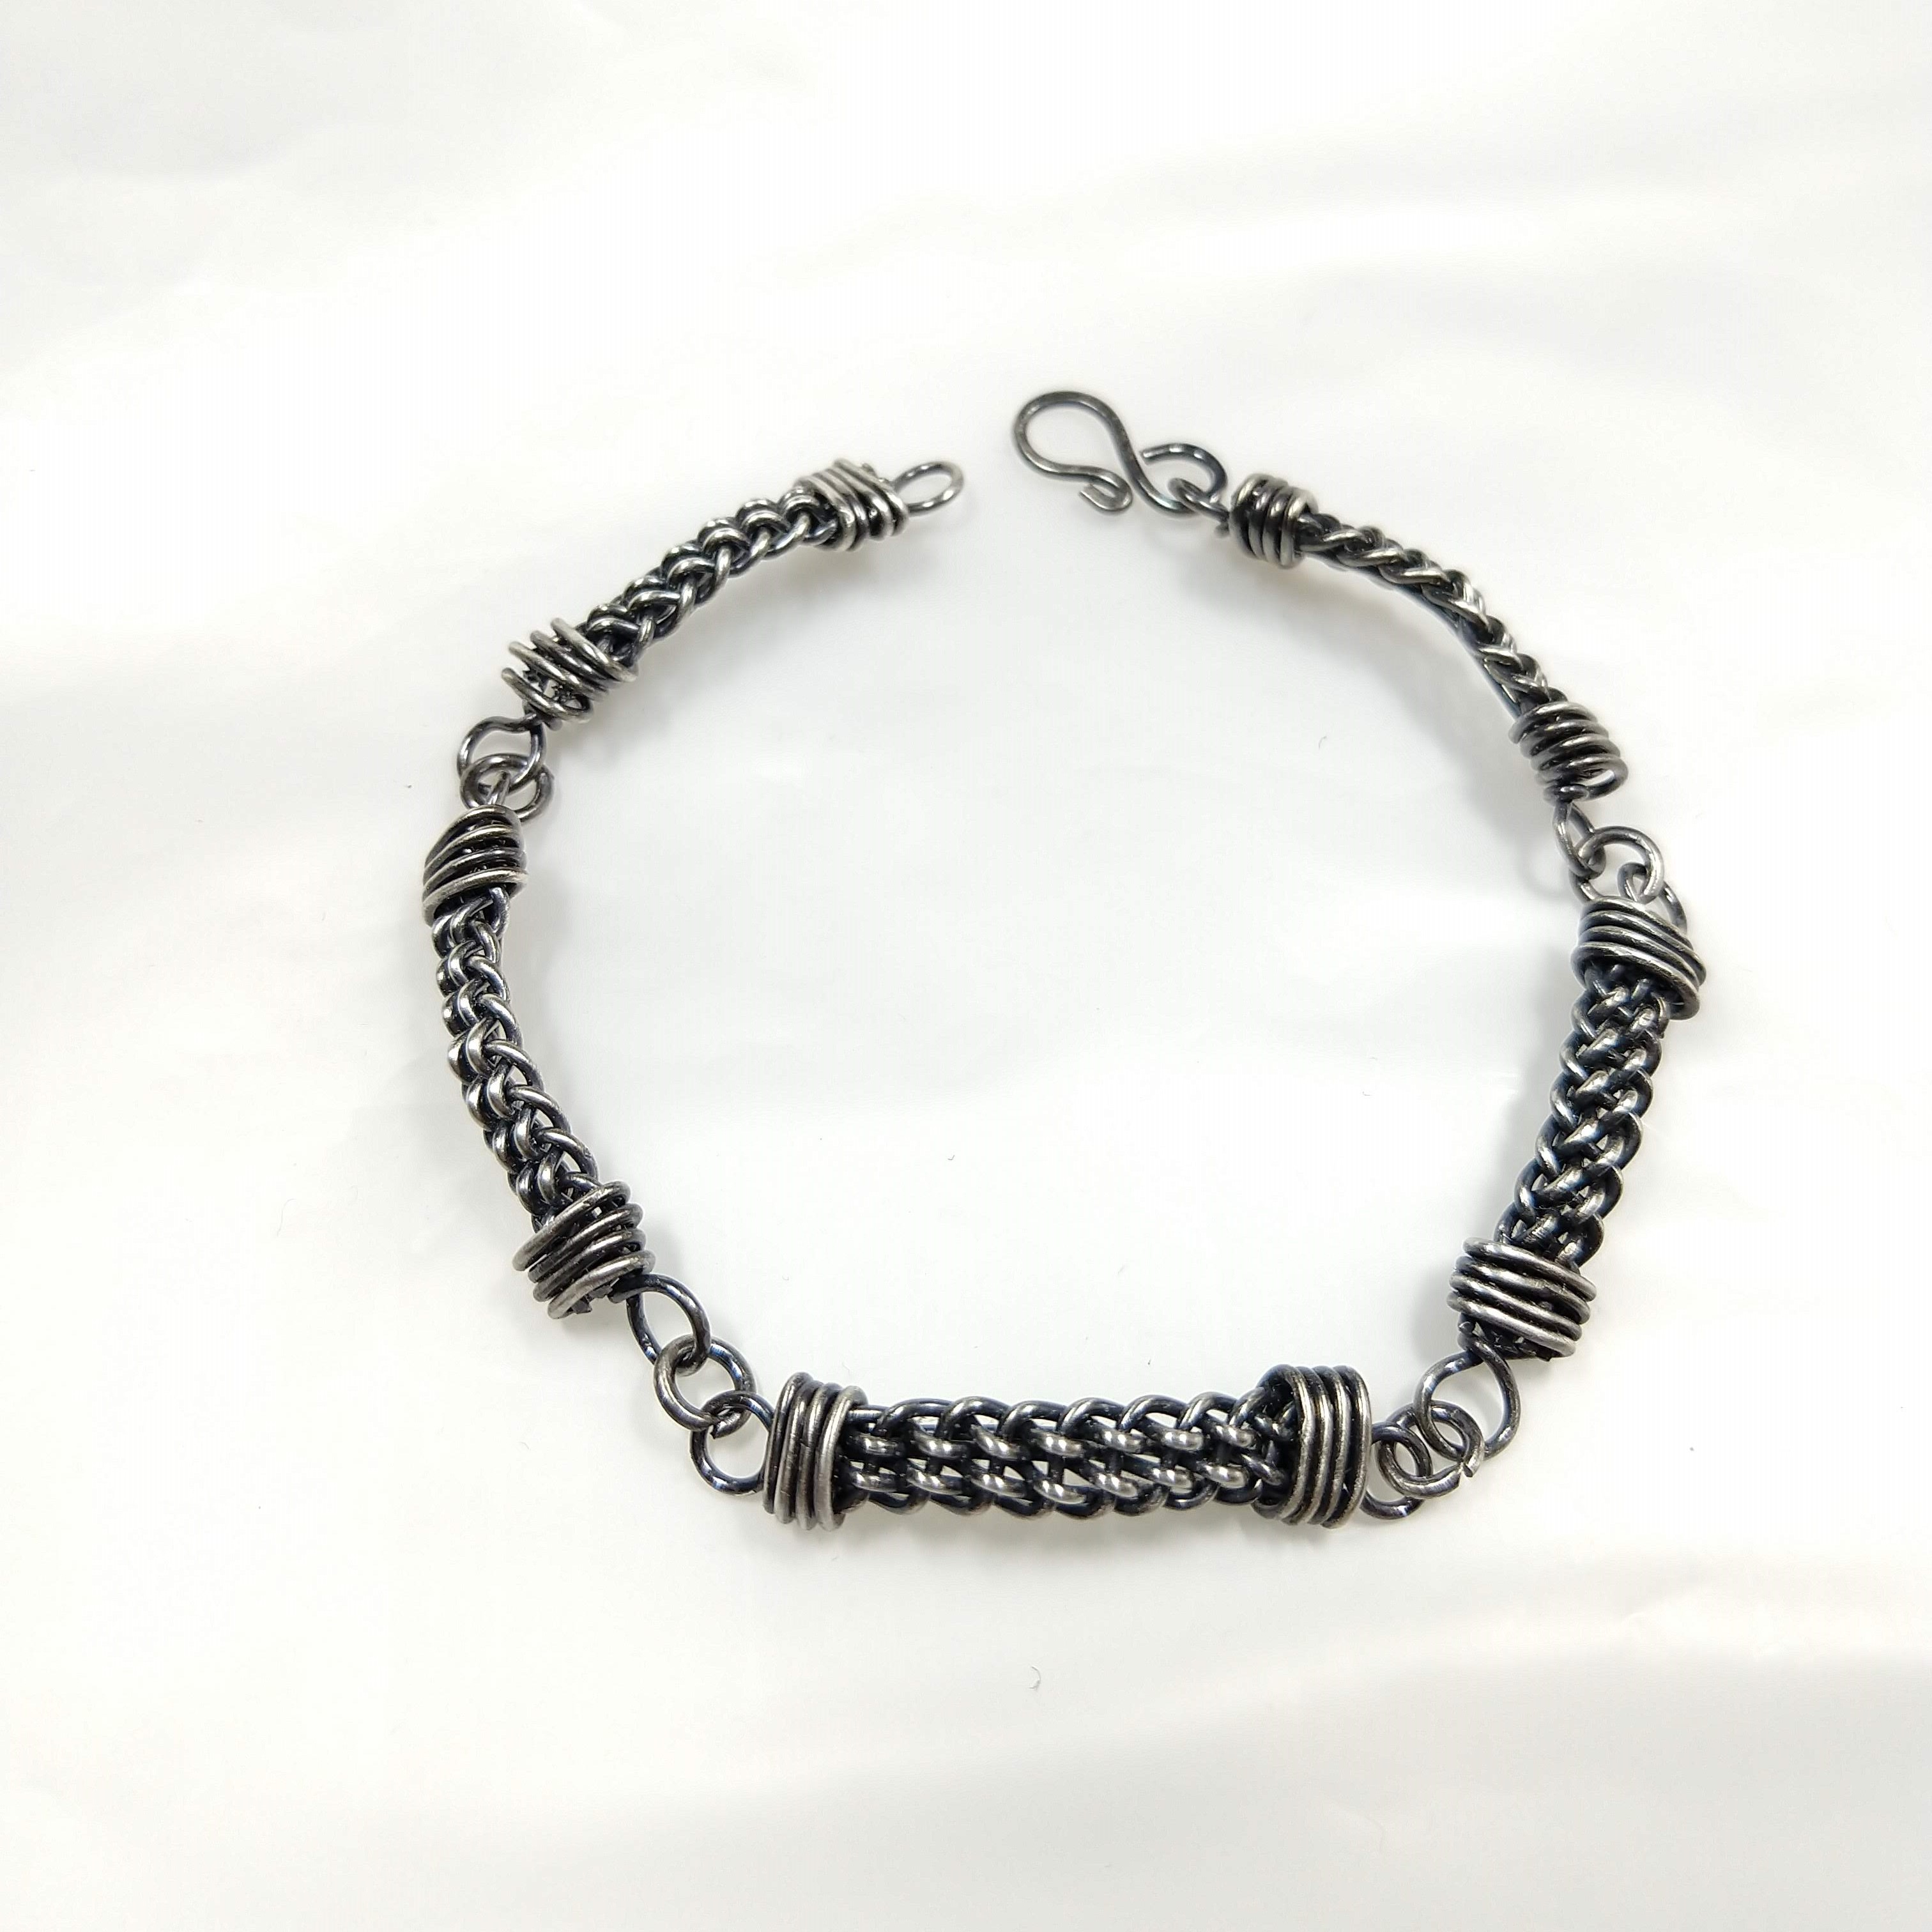 Woven Link Bracelet